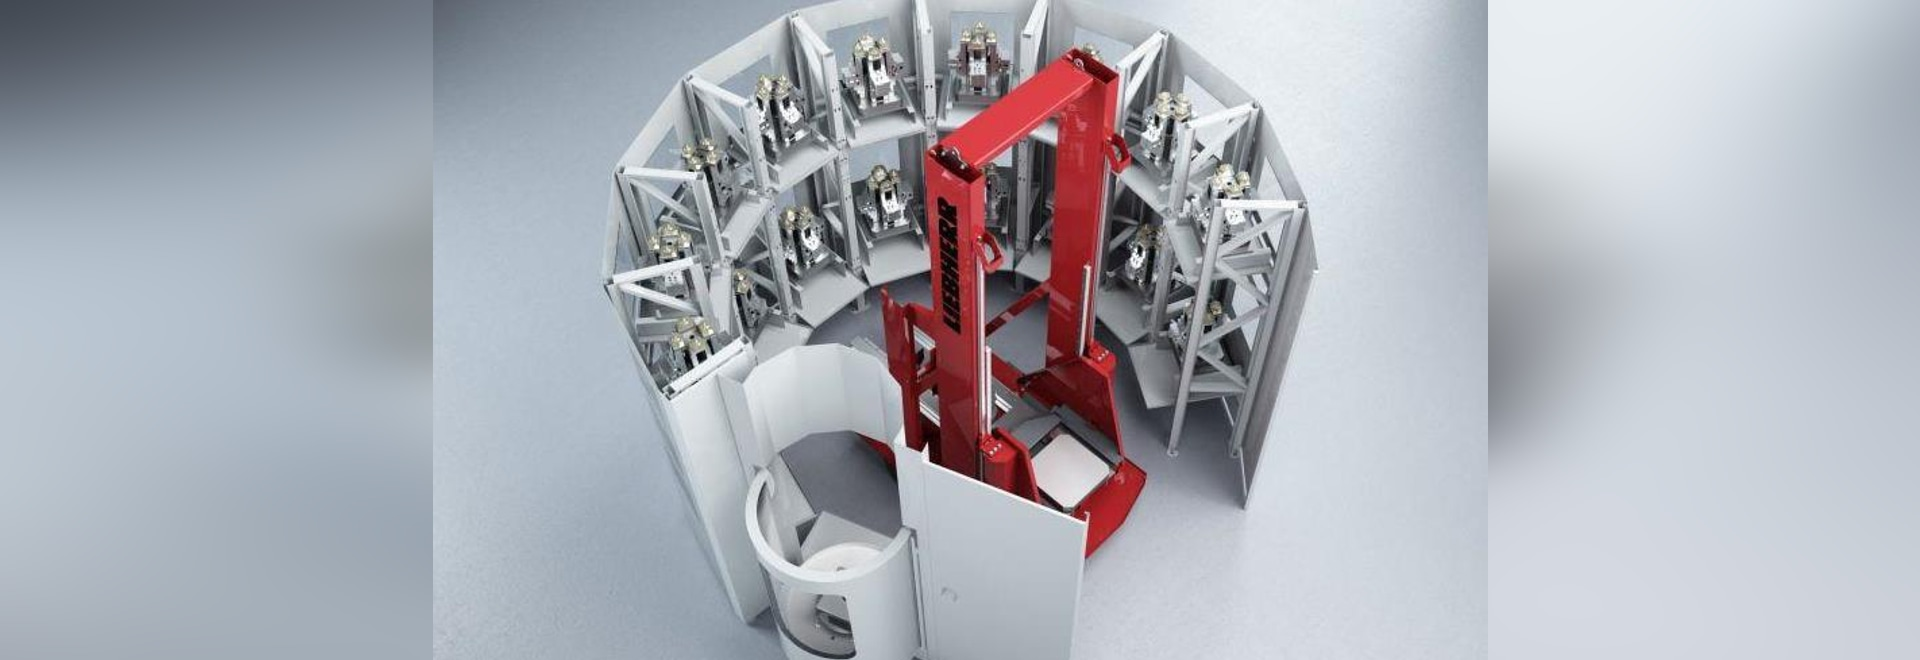 Rotary Loading System Boosts Machine Utilization